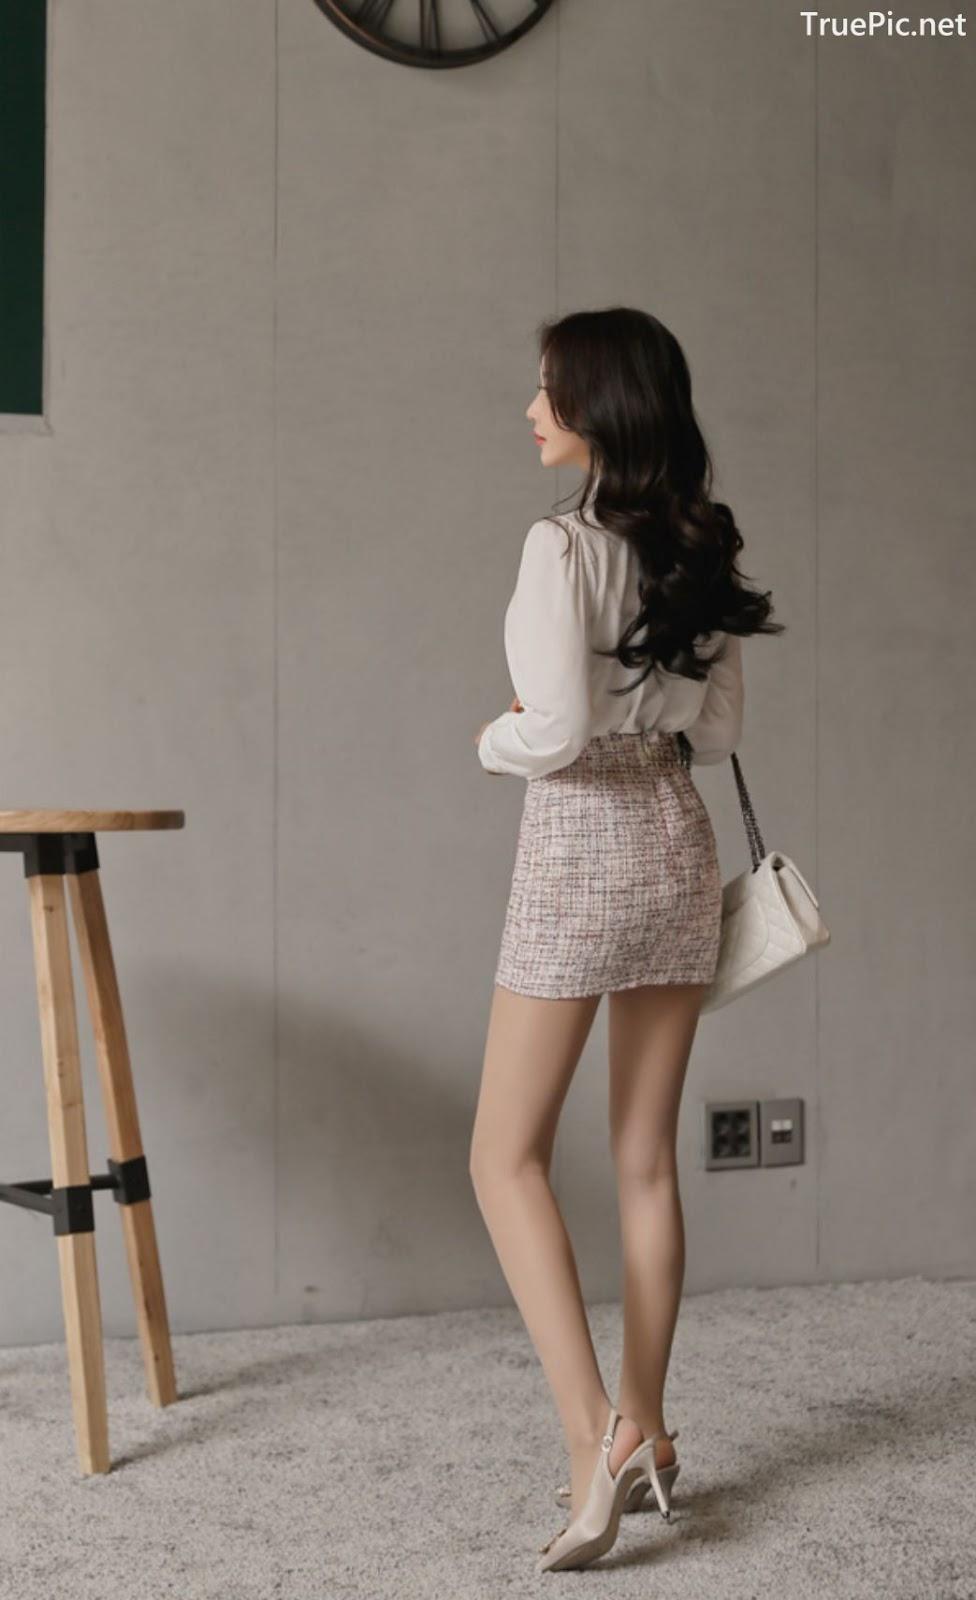 Image-Hot-Korean-Fashion-Model-Son-Yoon-Joo-She-So-Lovely-With-Miniskirt-TruePic.net- Picture-10